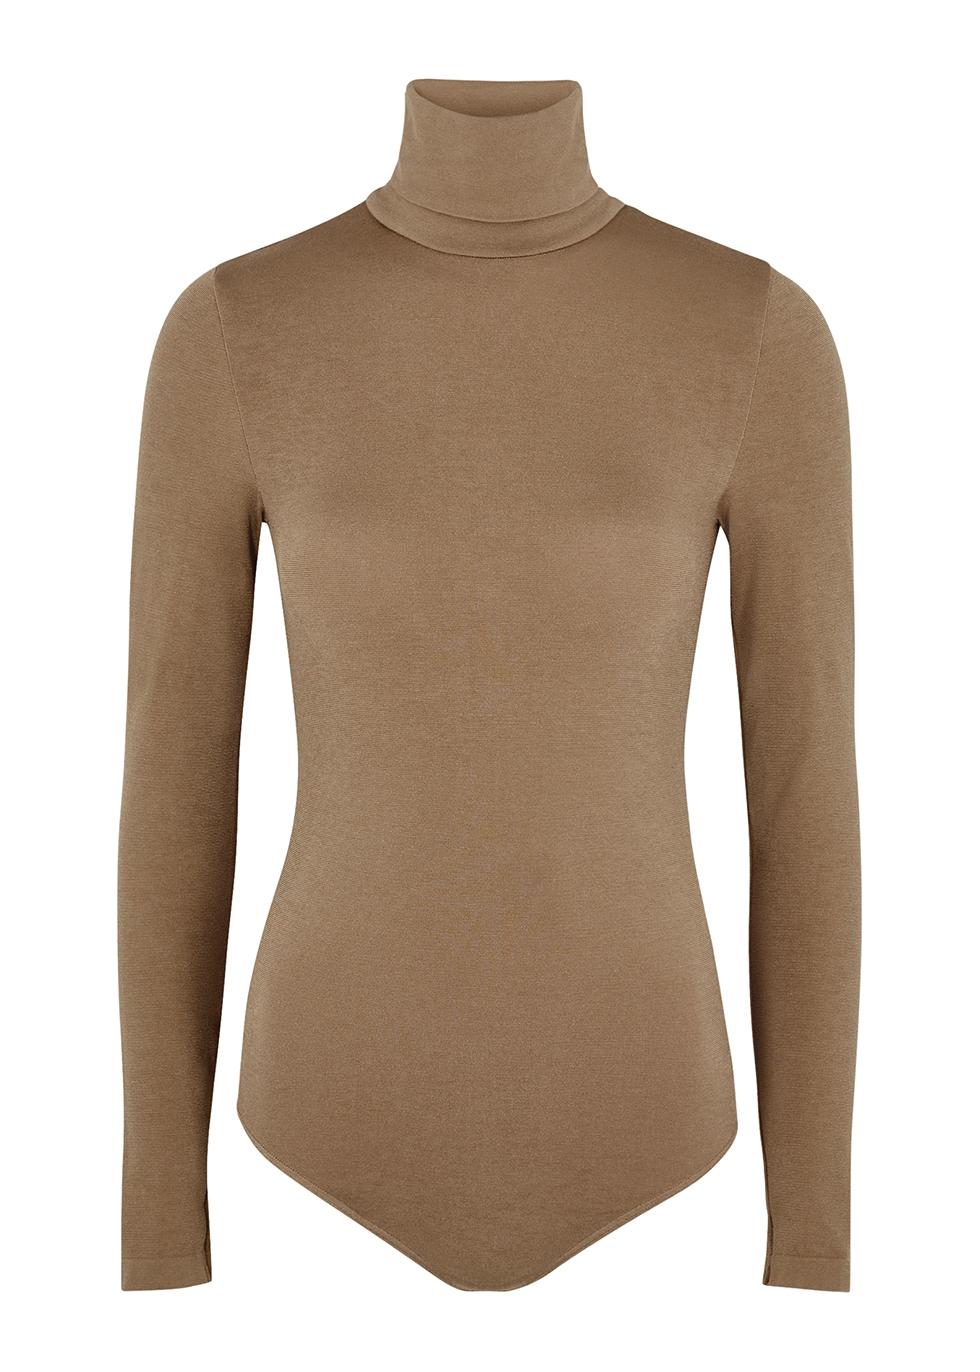 Colorado brown cotton-blend bodysuit